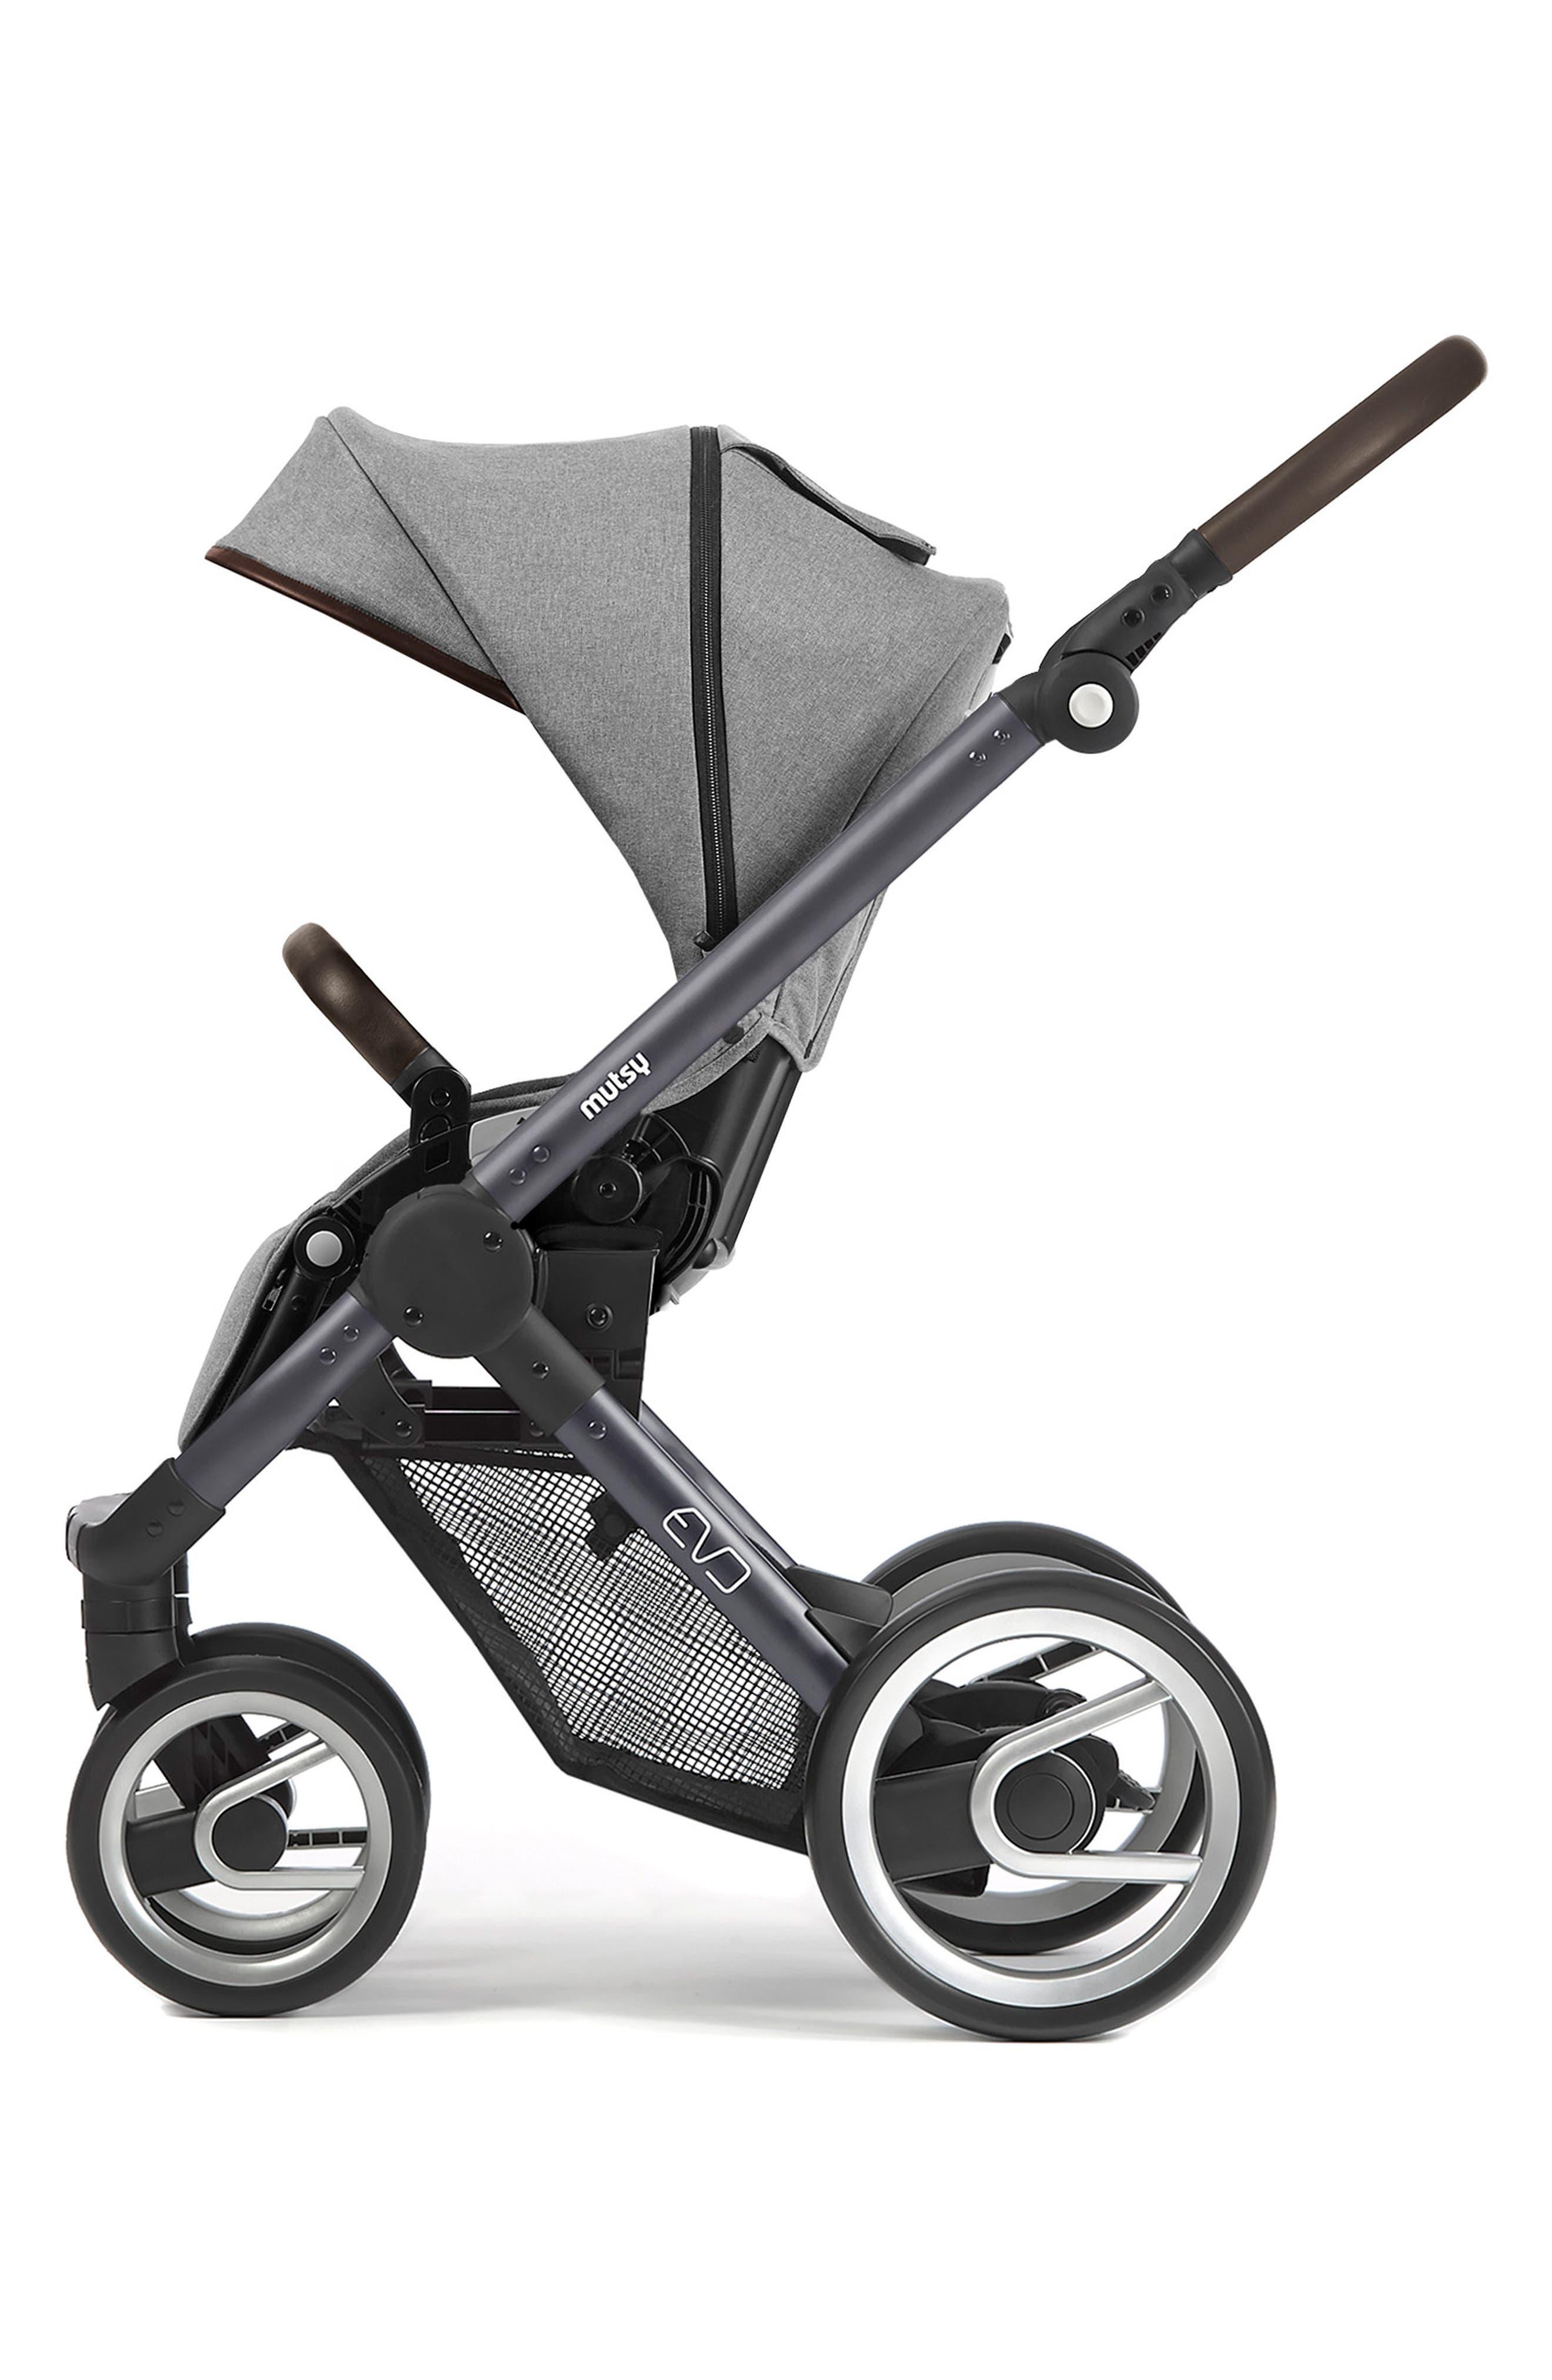 Evo - Farmer Earth Stroller,                             Alternate thumbnail 4, color,                             GREY